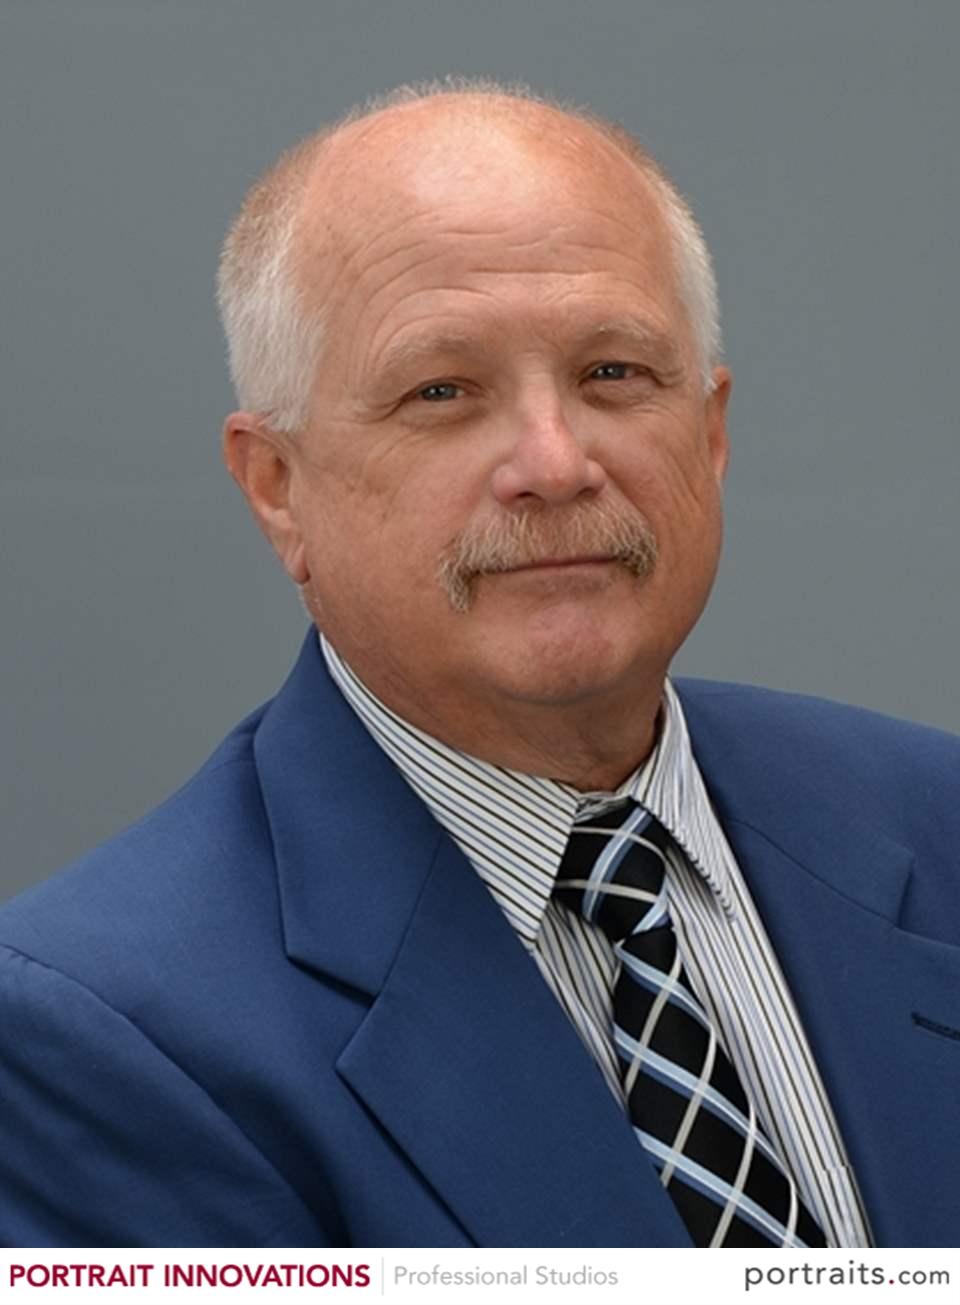 Russ Gray